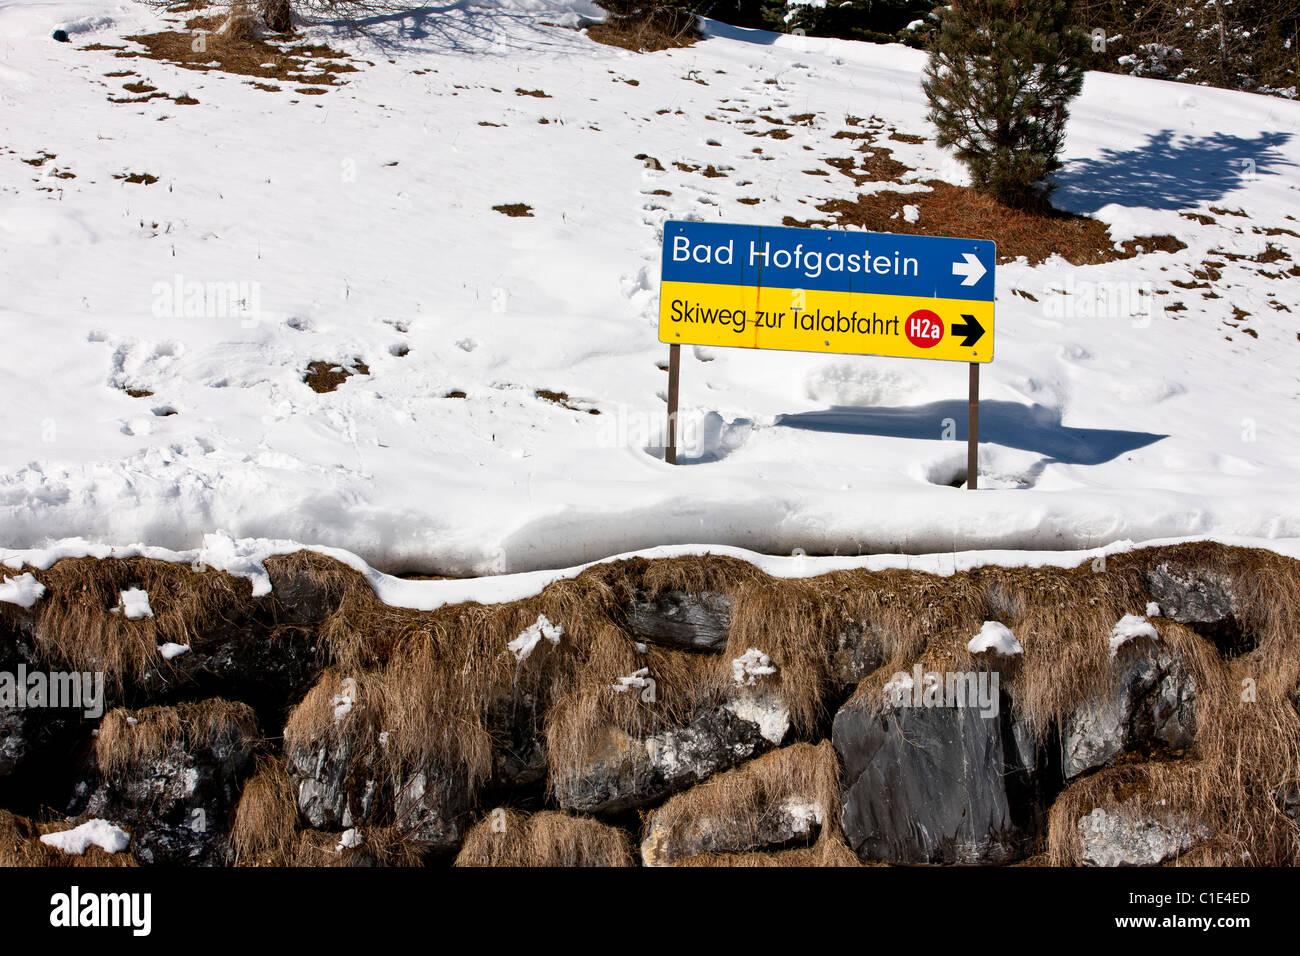 Ski run sign on slope above the ski resort of Bad Hofgastein. - Stock Image